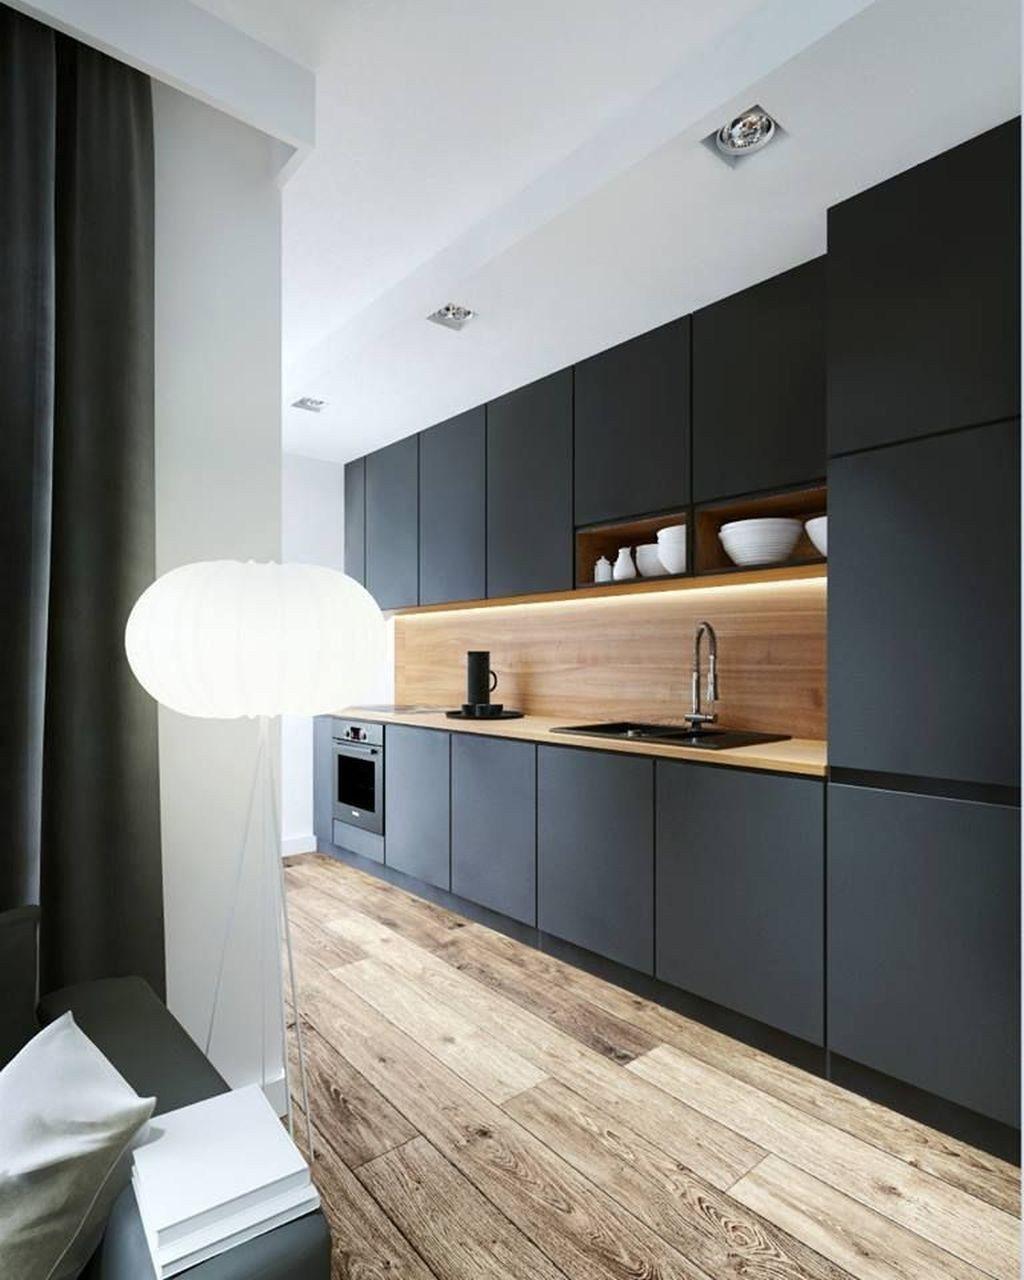 40 Small Kitchen Design Ideas: 40 Awesome Black Kitchen Design Ideas